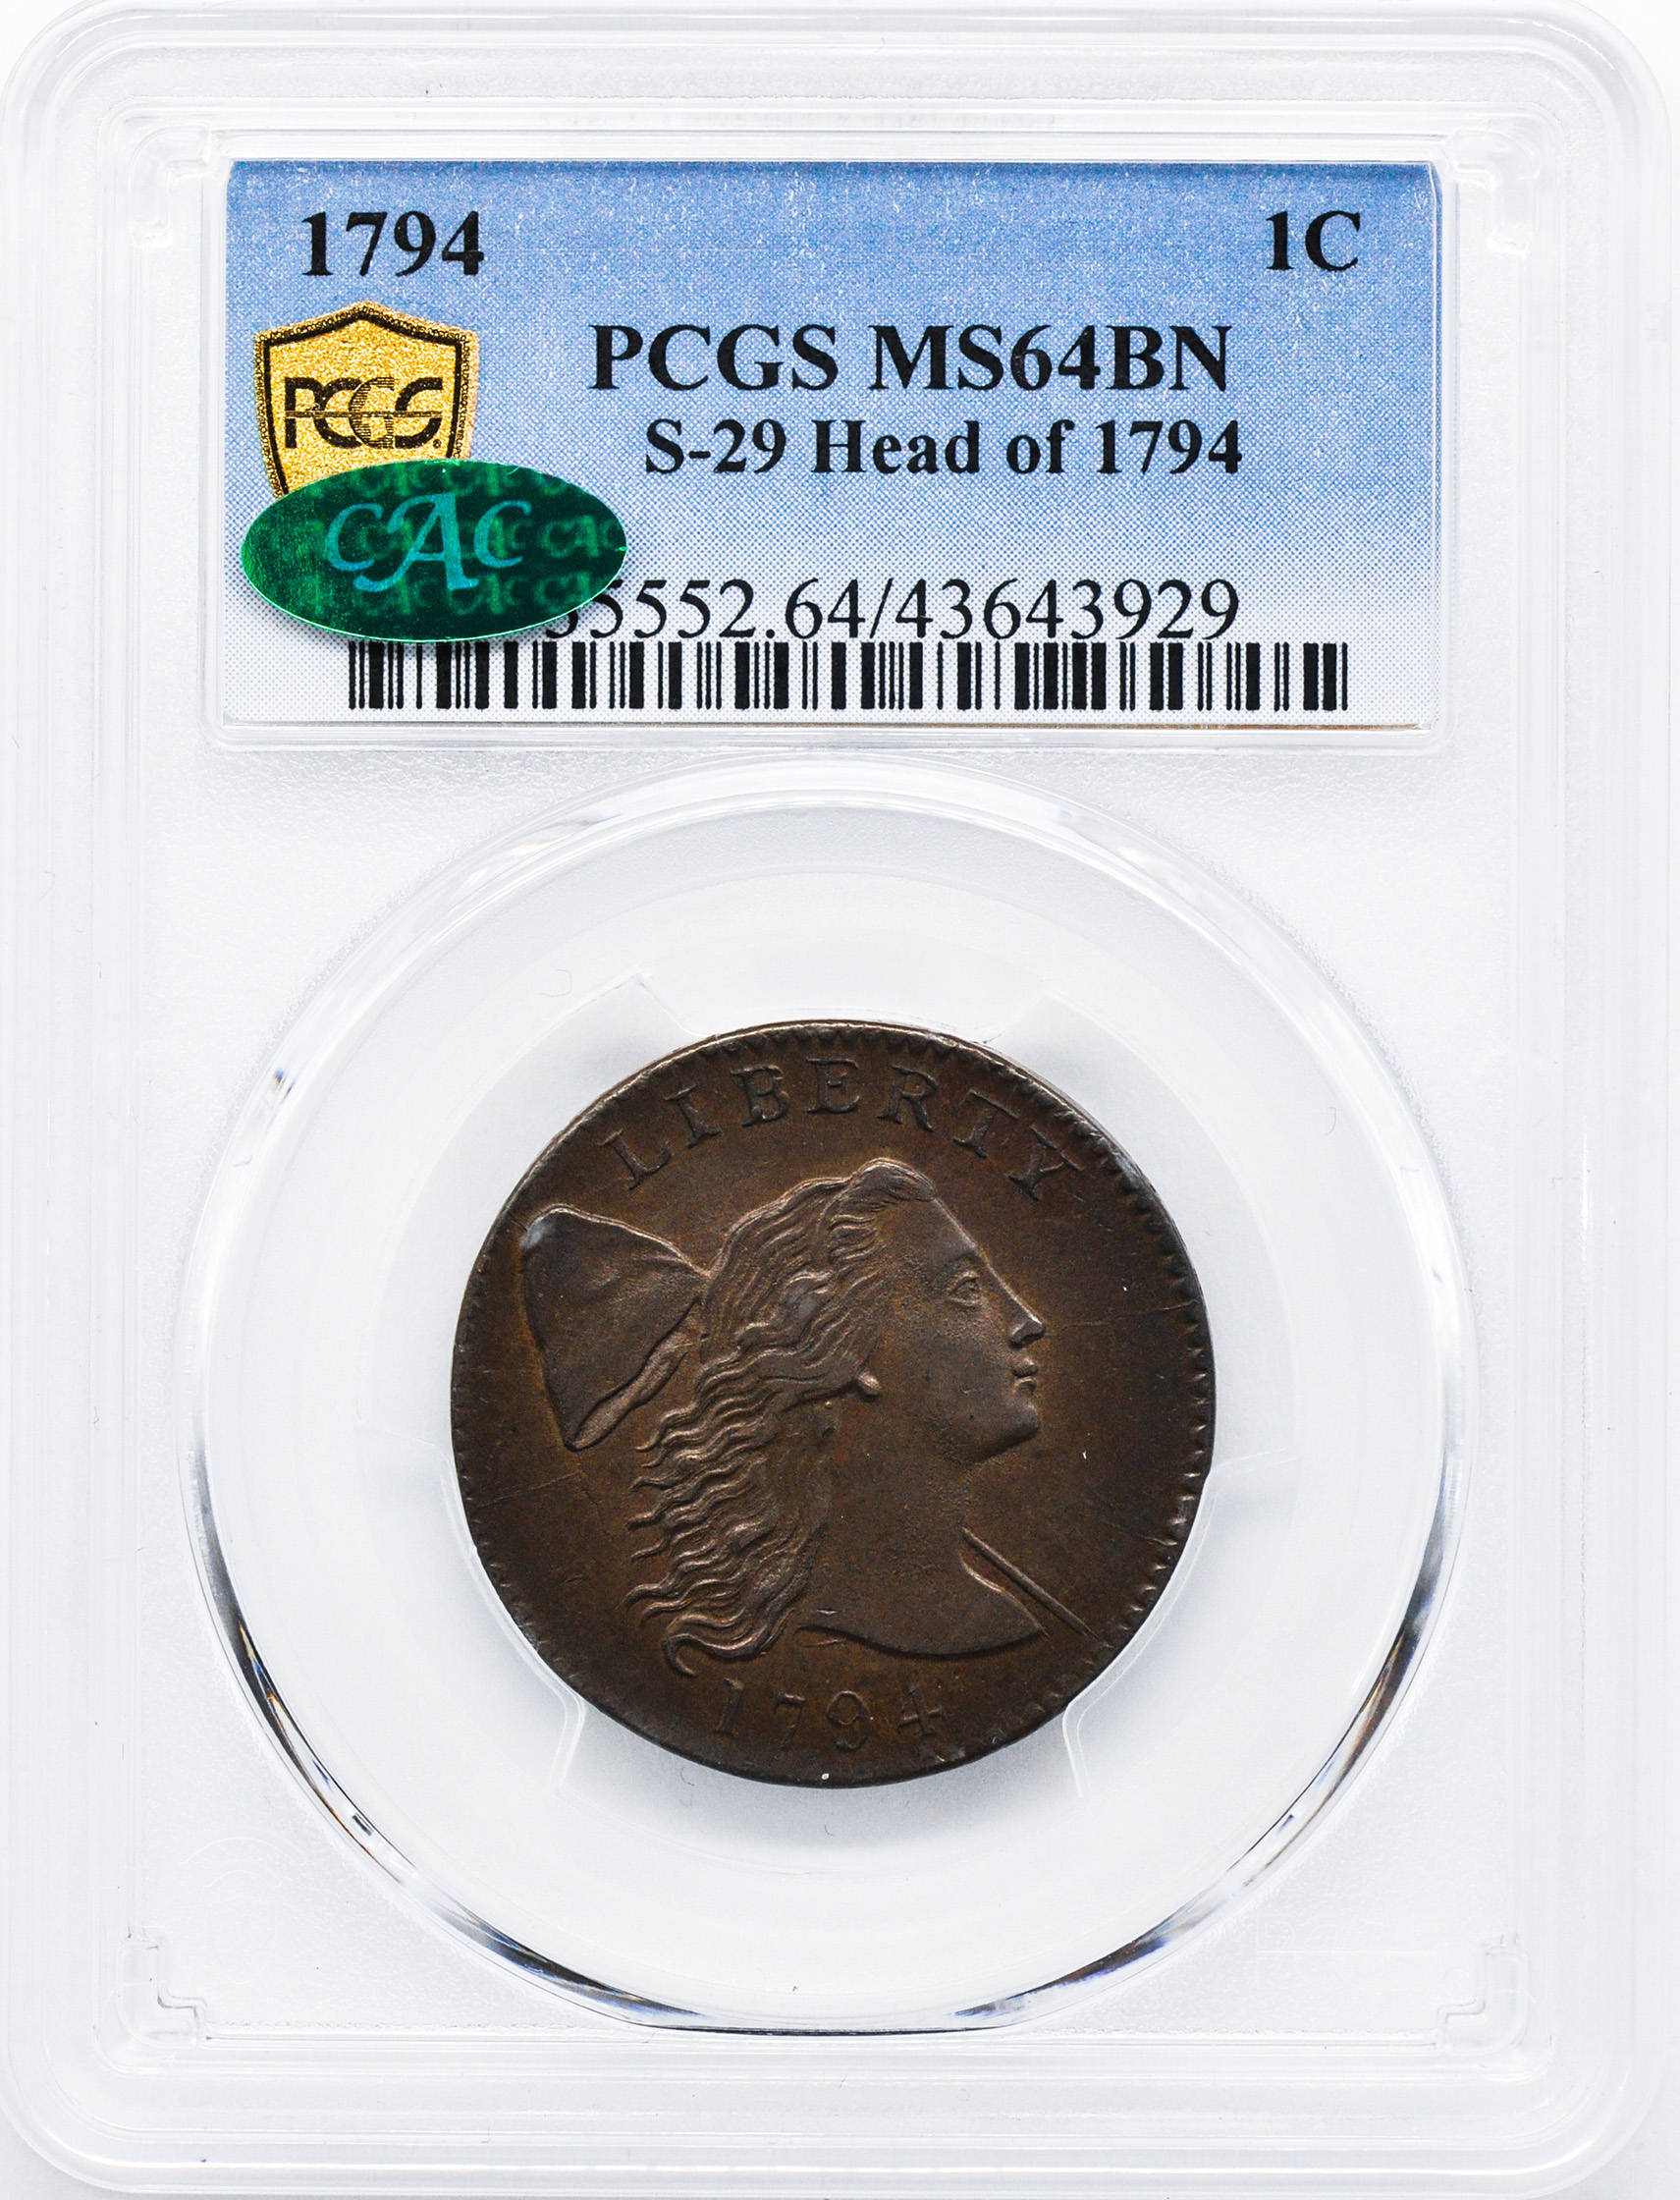 1794 FLOWING HAIR LARGE 1C, HEAD OF 1794, DENT  BORDER MS65 Brown